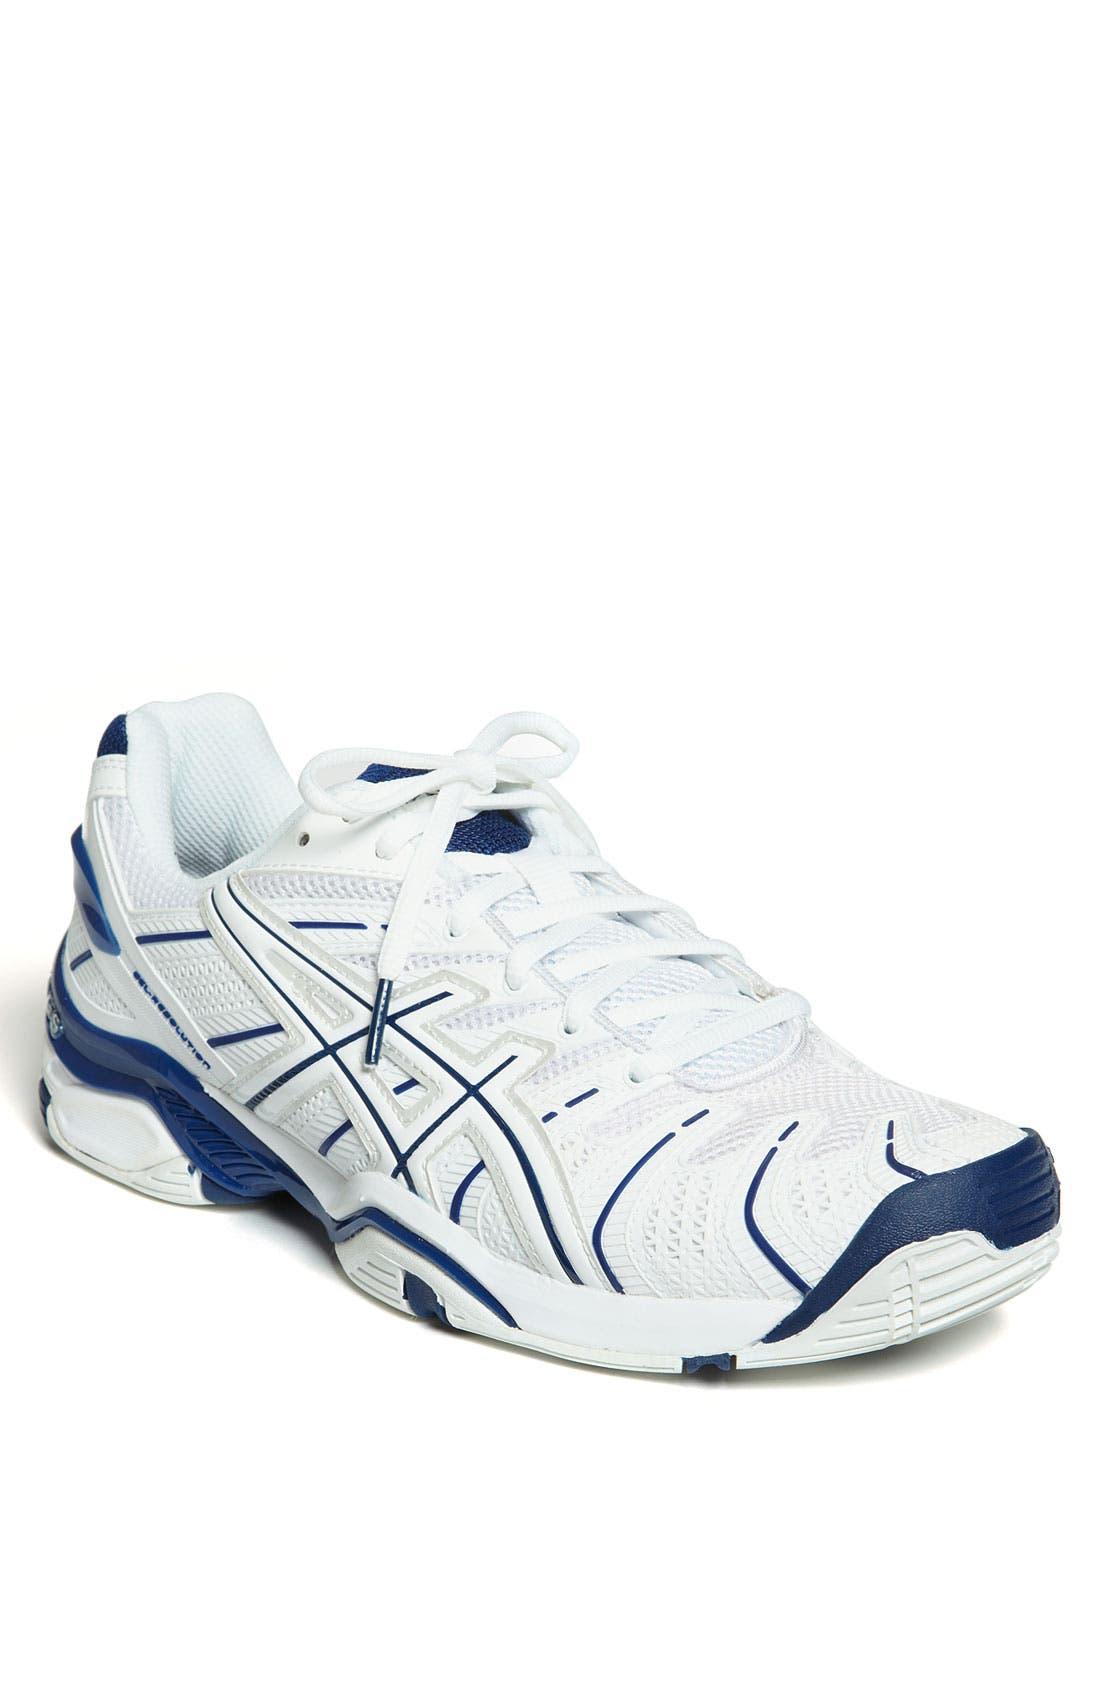 Alternate Image 1 Selected - ASICS® 'GEL-Resolution 4' Tennis Shoe (Men)